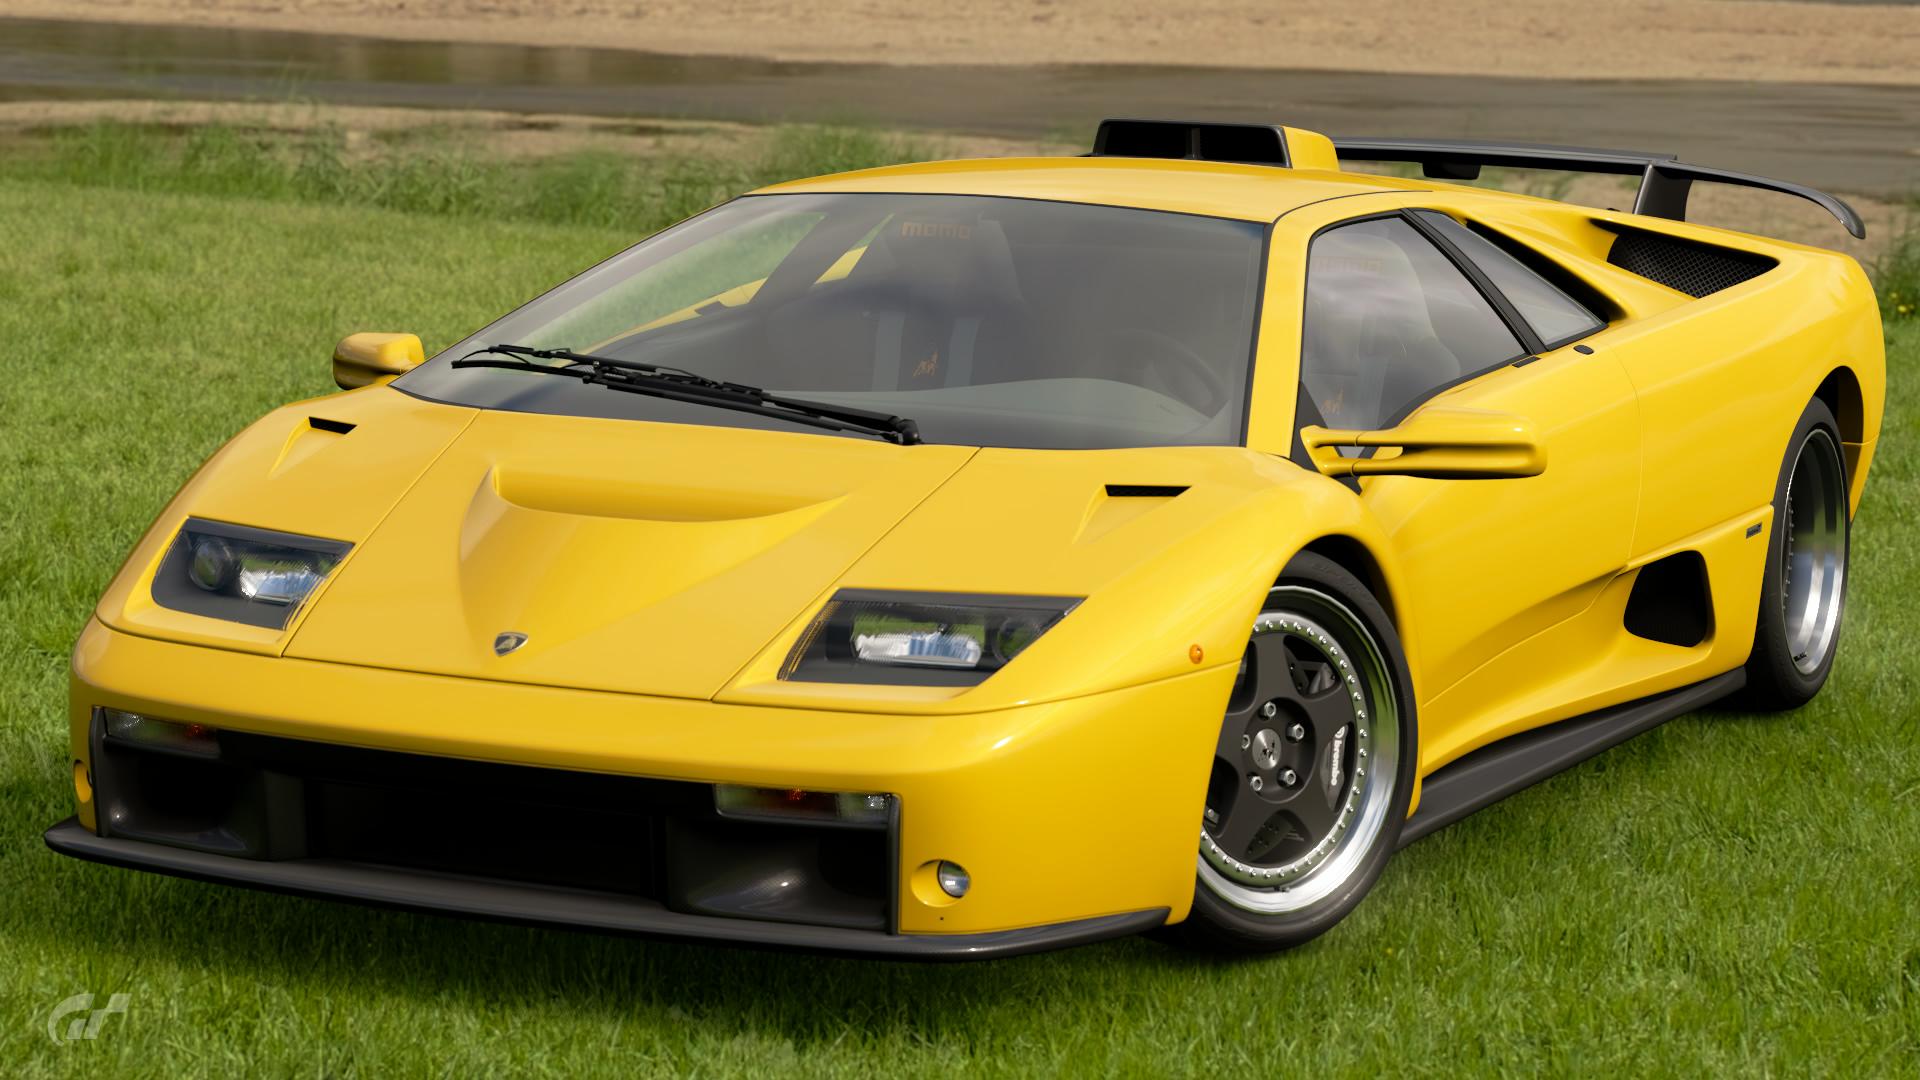 Lamborghini Diablo GT U002700